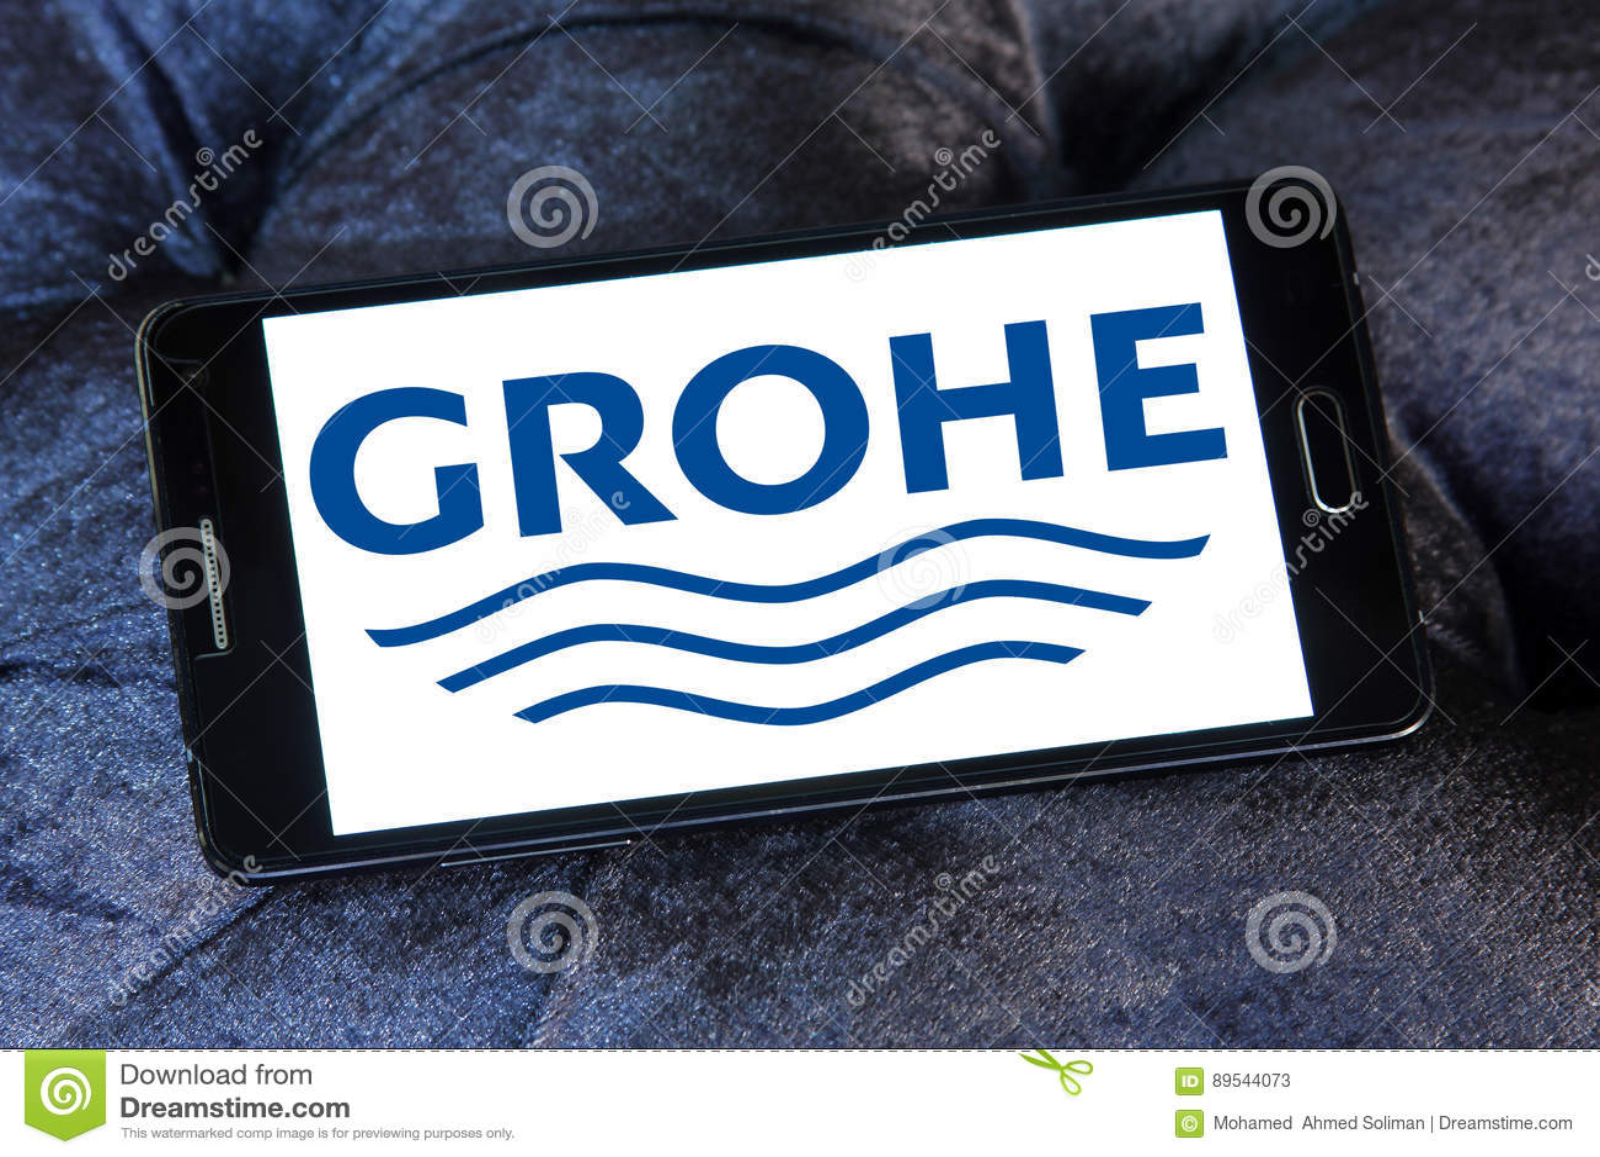 Grohe logo editorial stock photo. Image of laufen, brand - 89544073